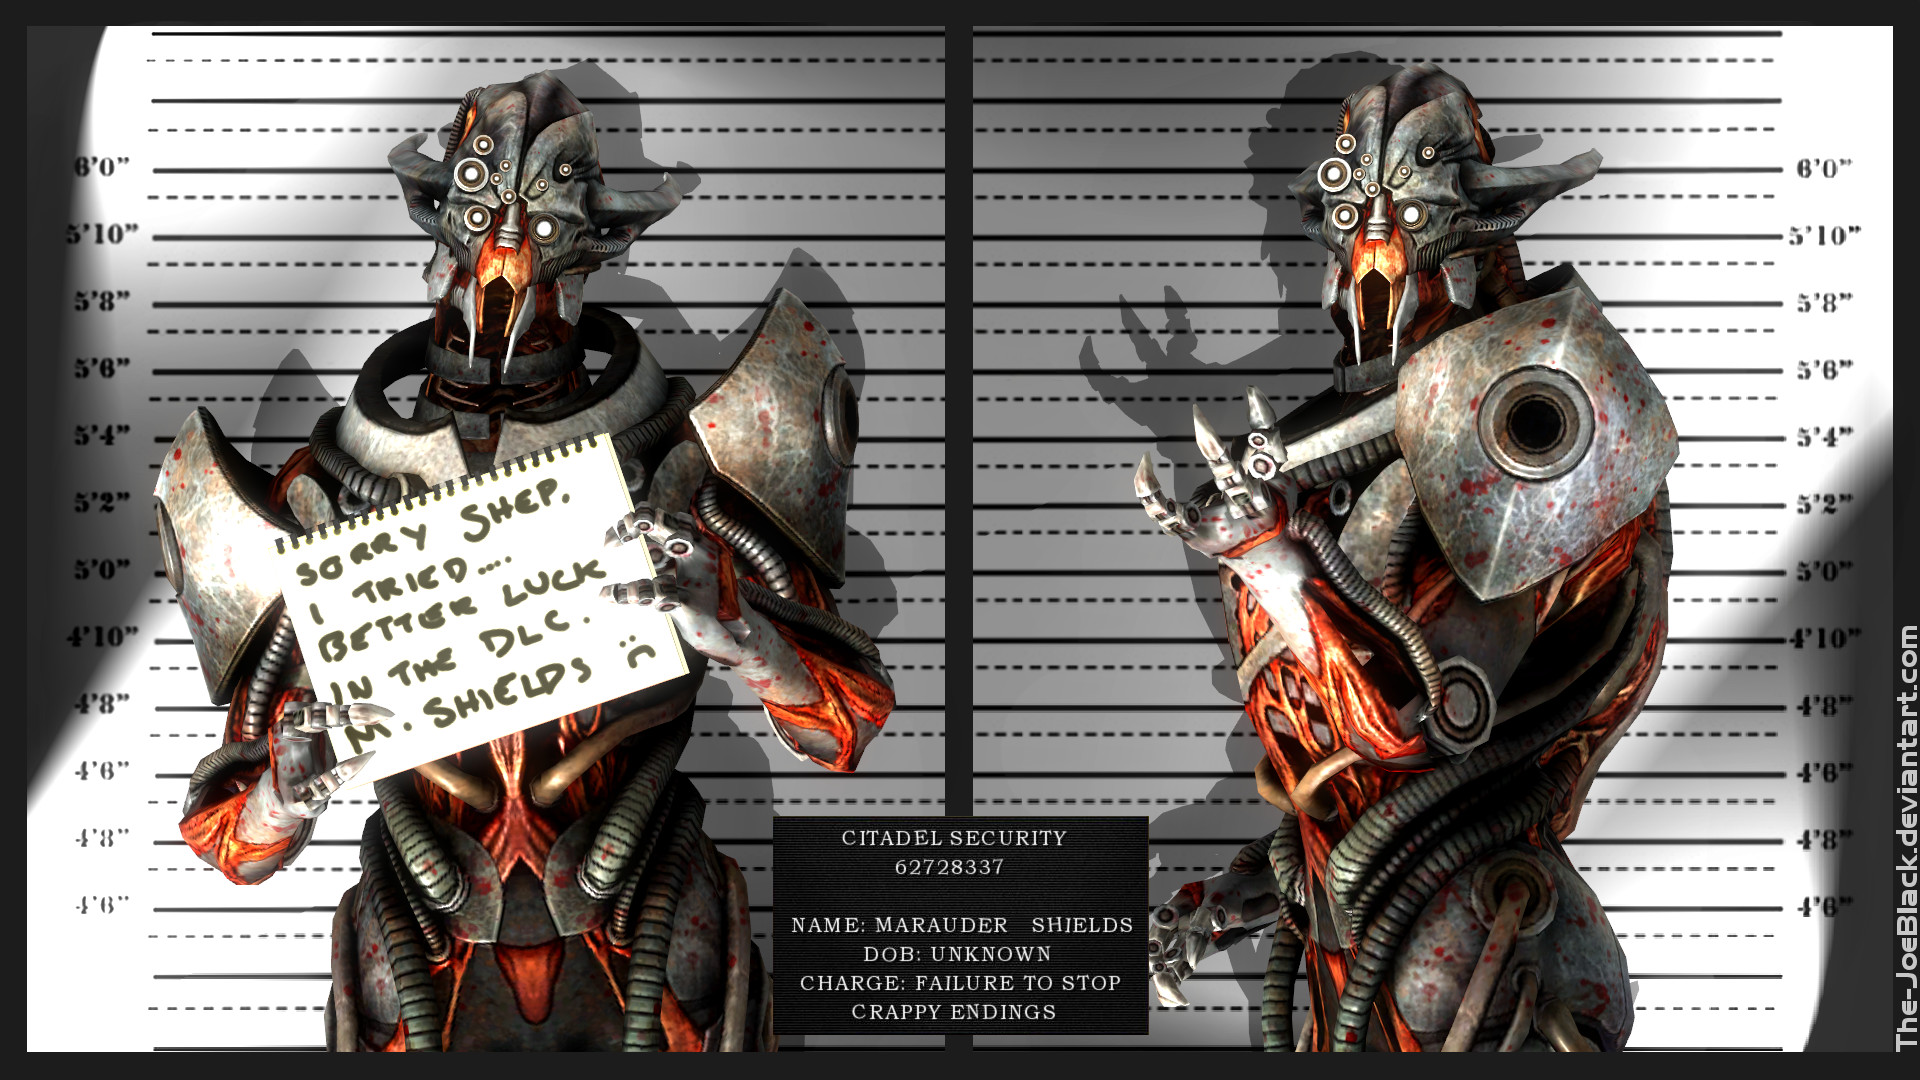 mass_effect_mugshot___marauder_shields_b